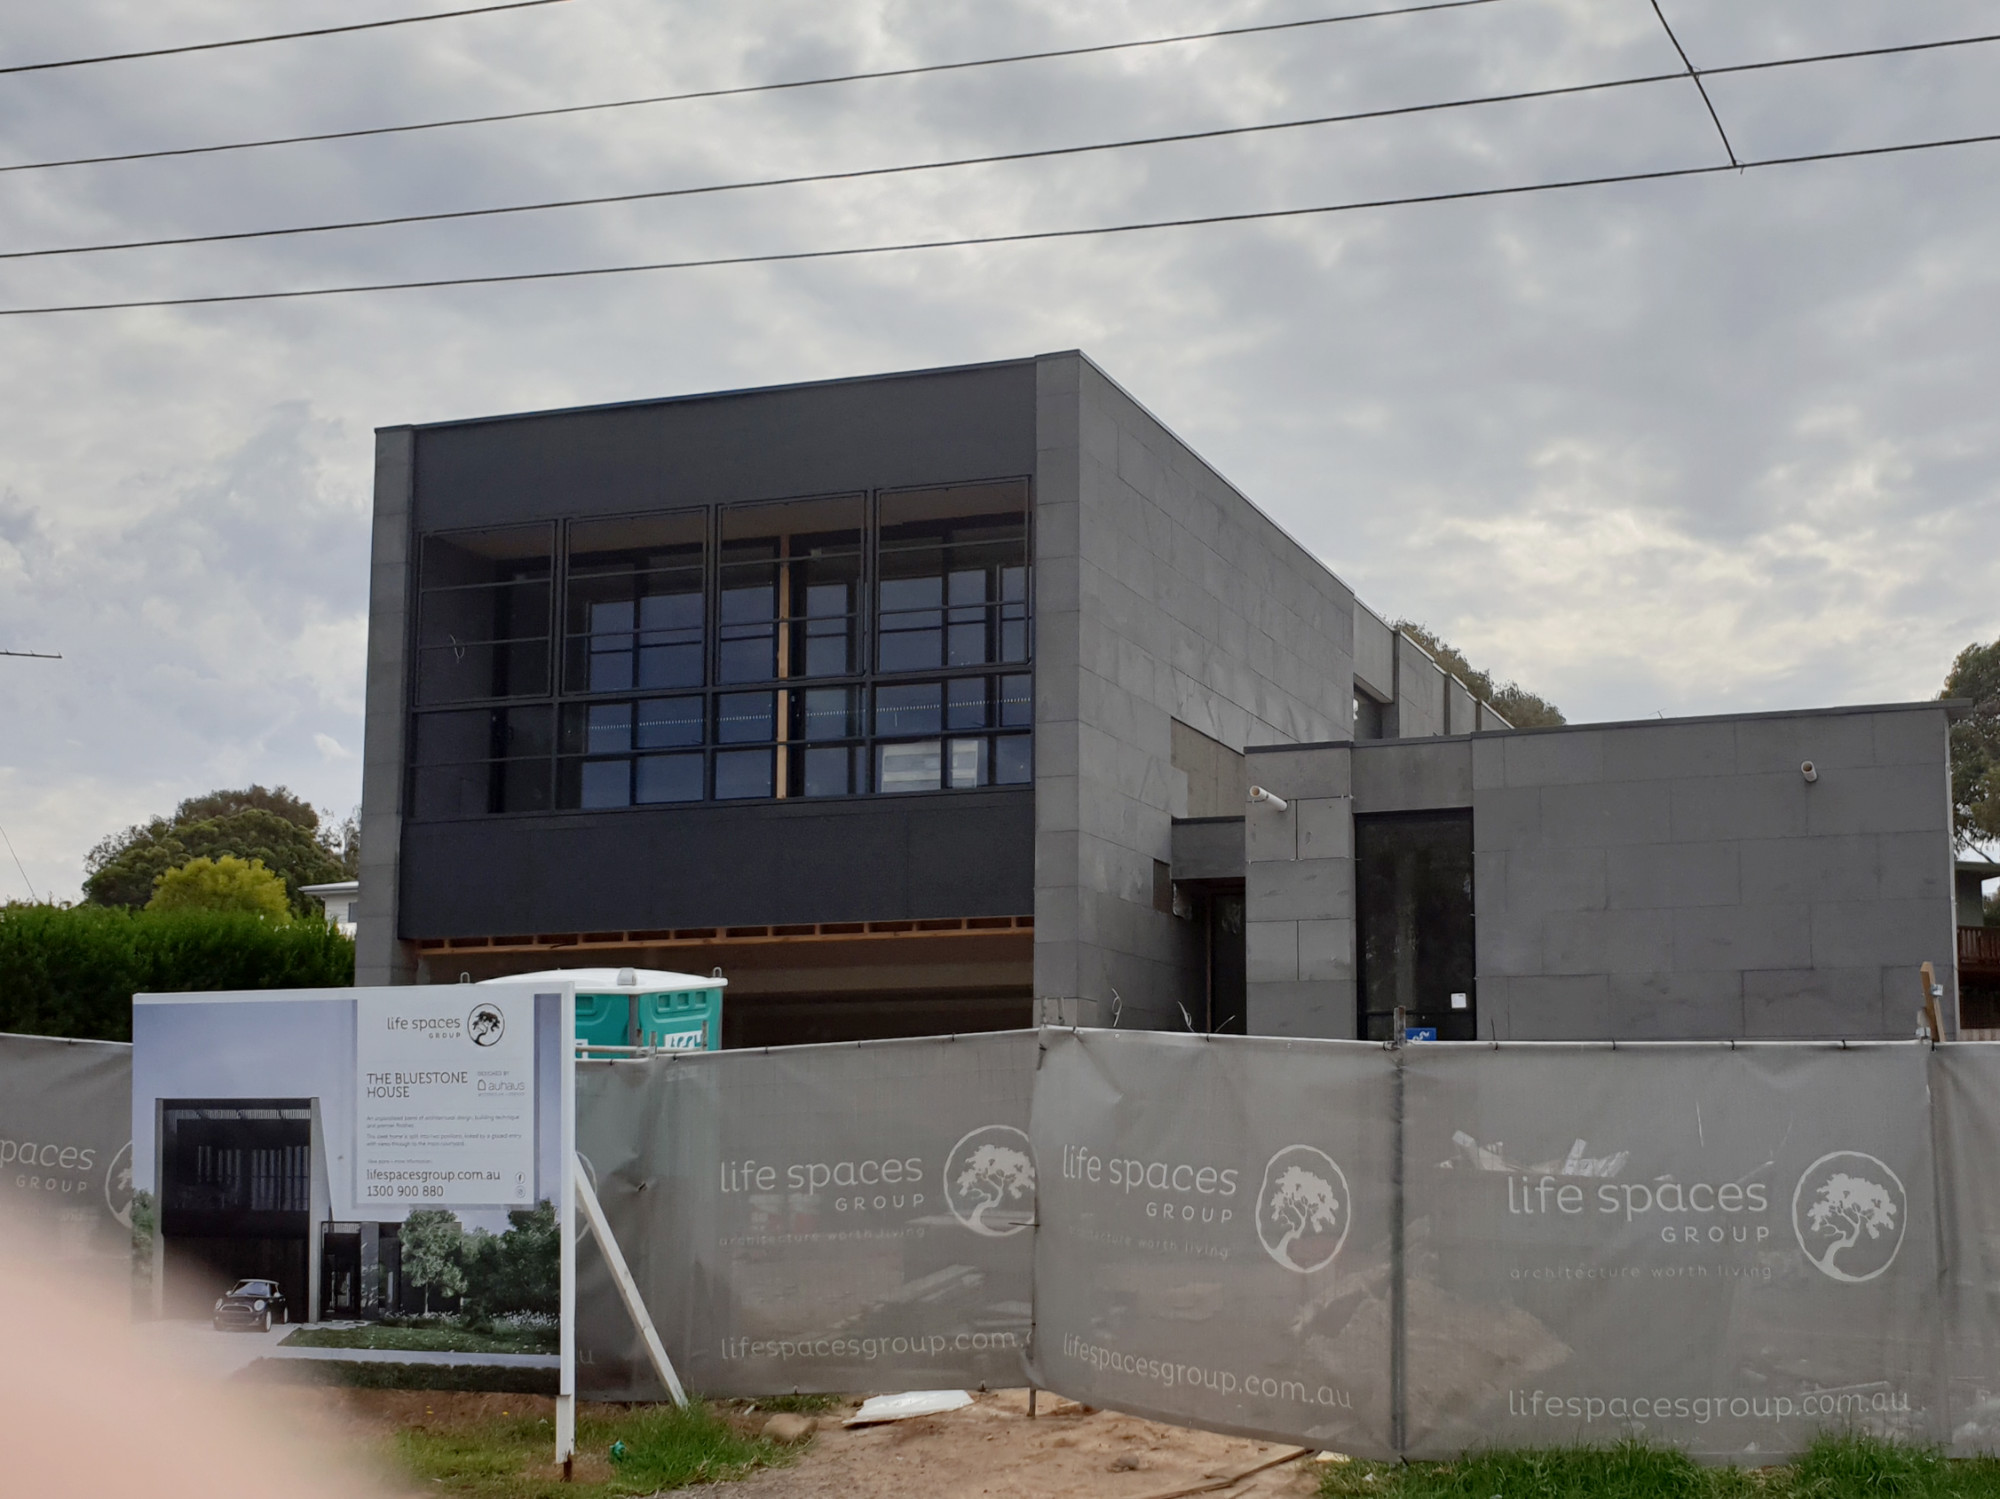 lifespaces bluestone house exterior1.jpg